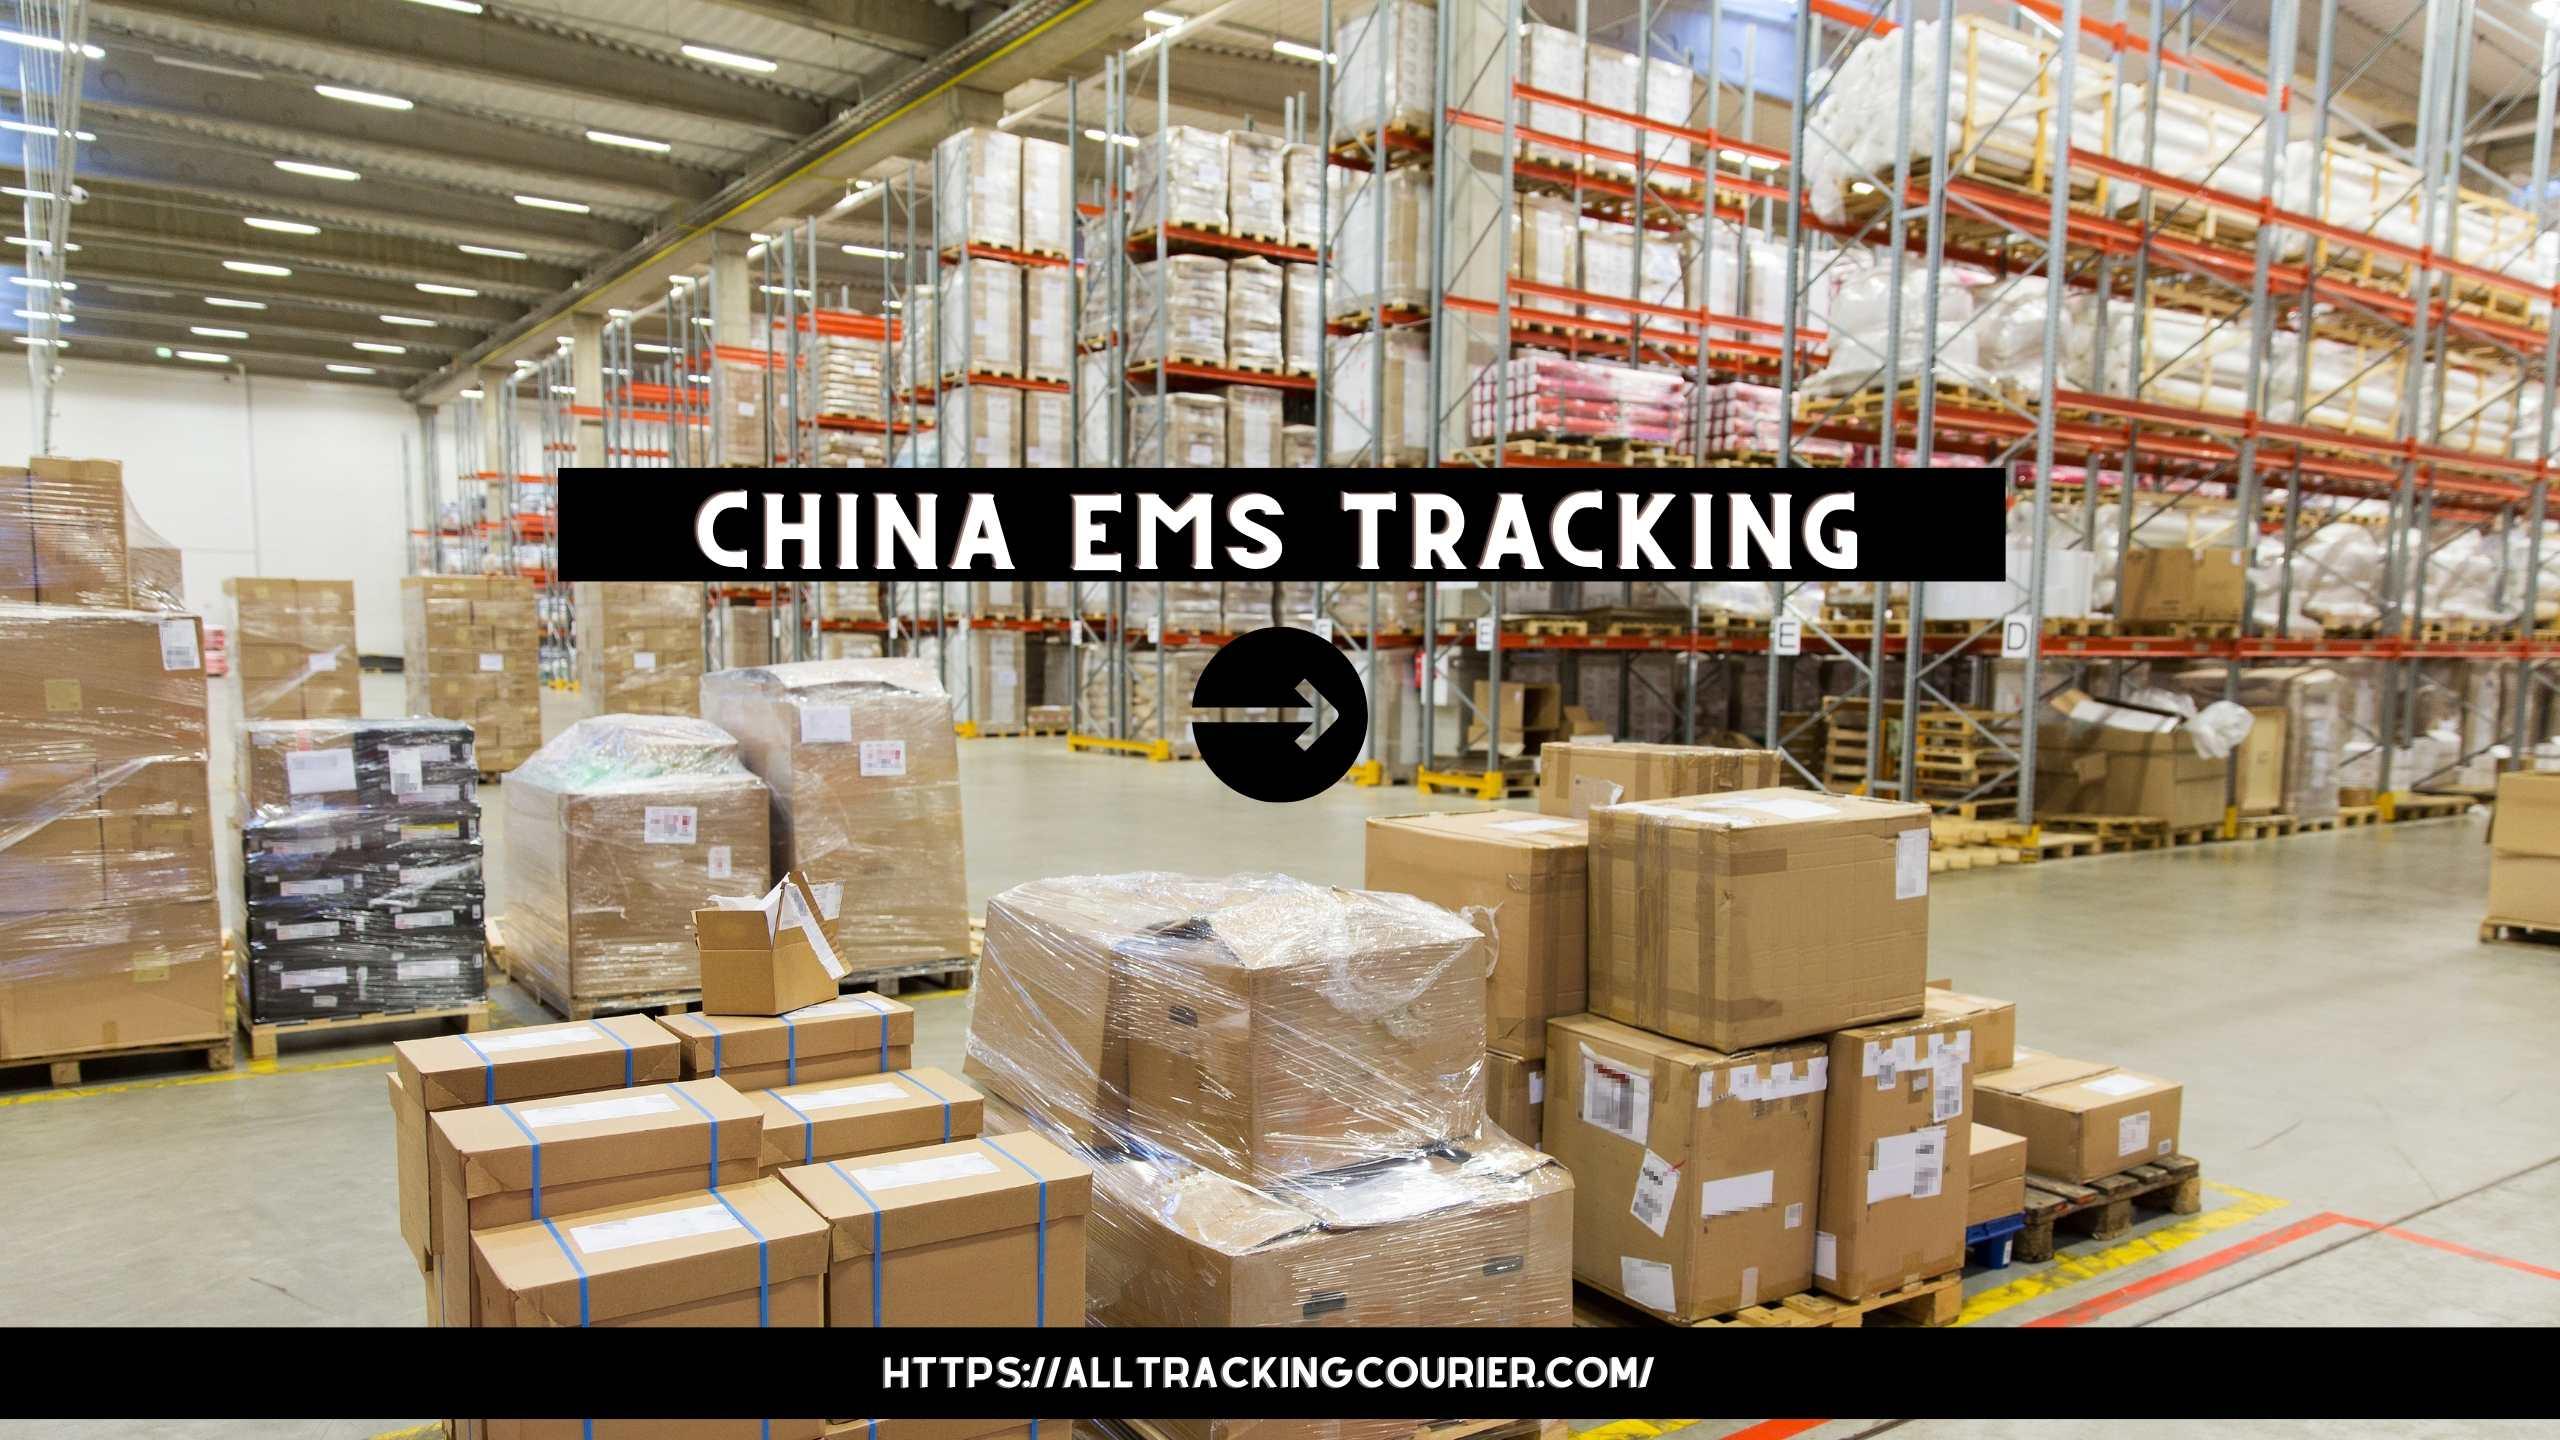 China EMS Tracking